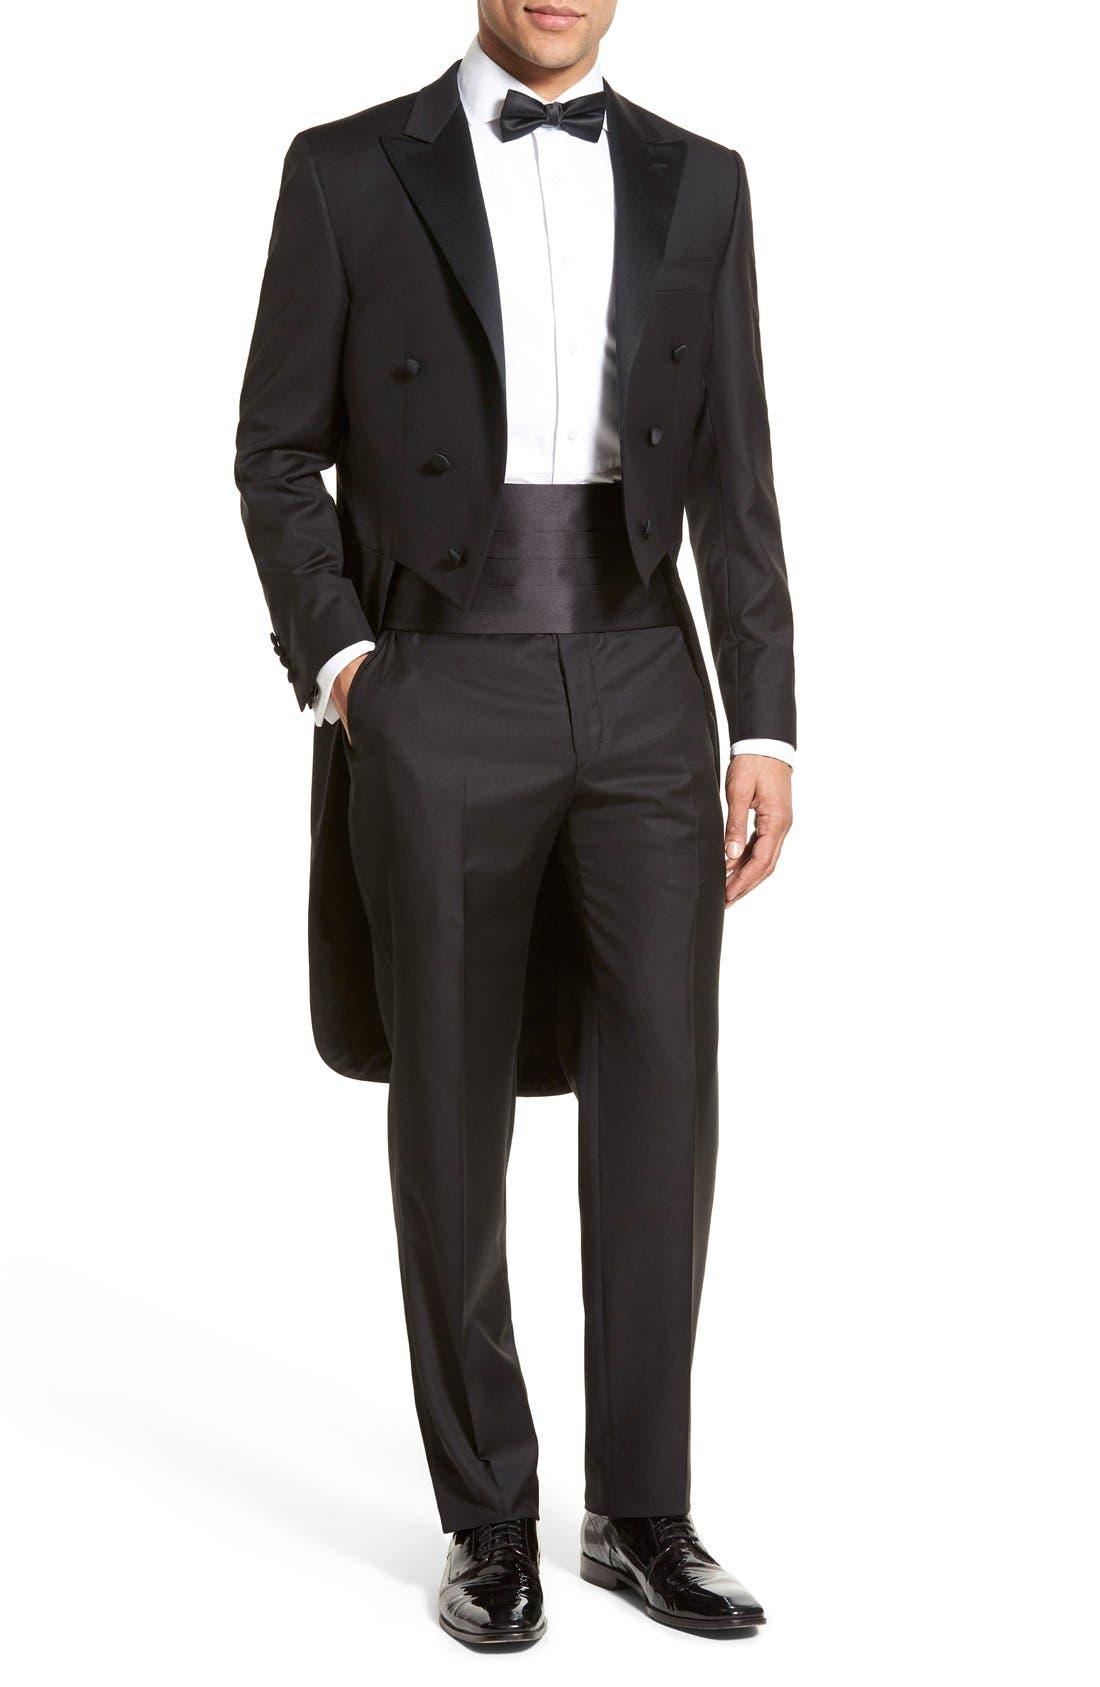 Main Image - Hickey Freeman Classic B Fit Tasmanian Wool Tailcoat Tuxedo